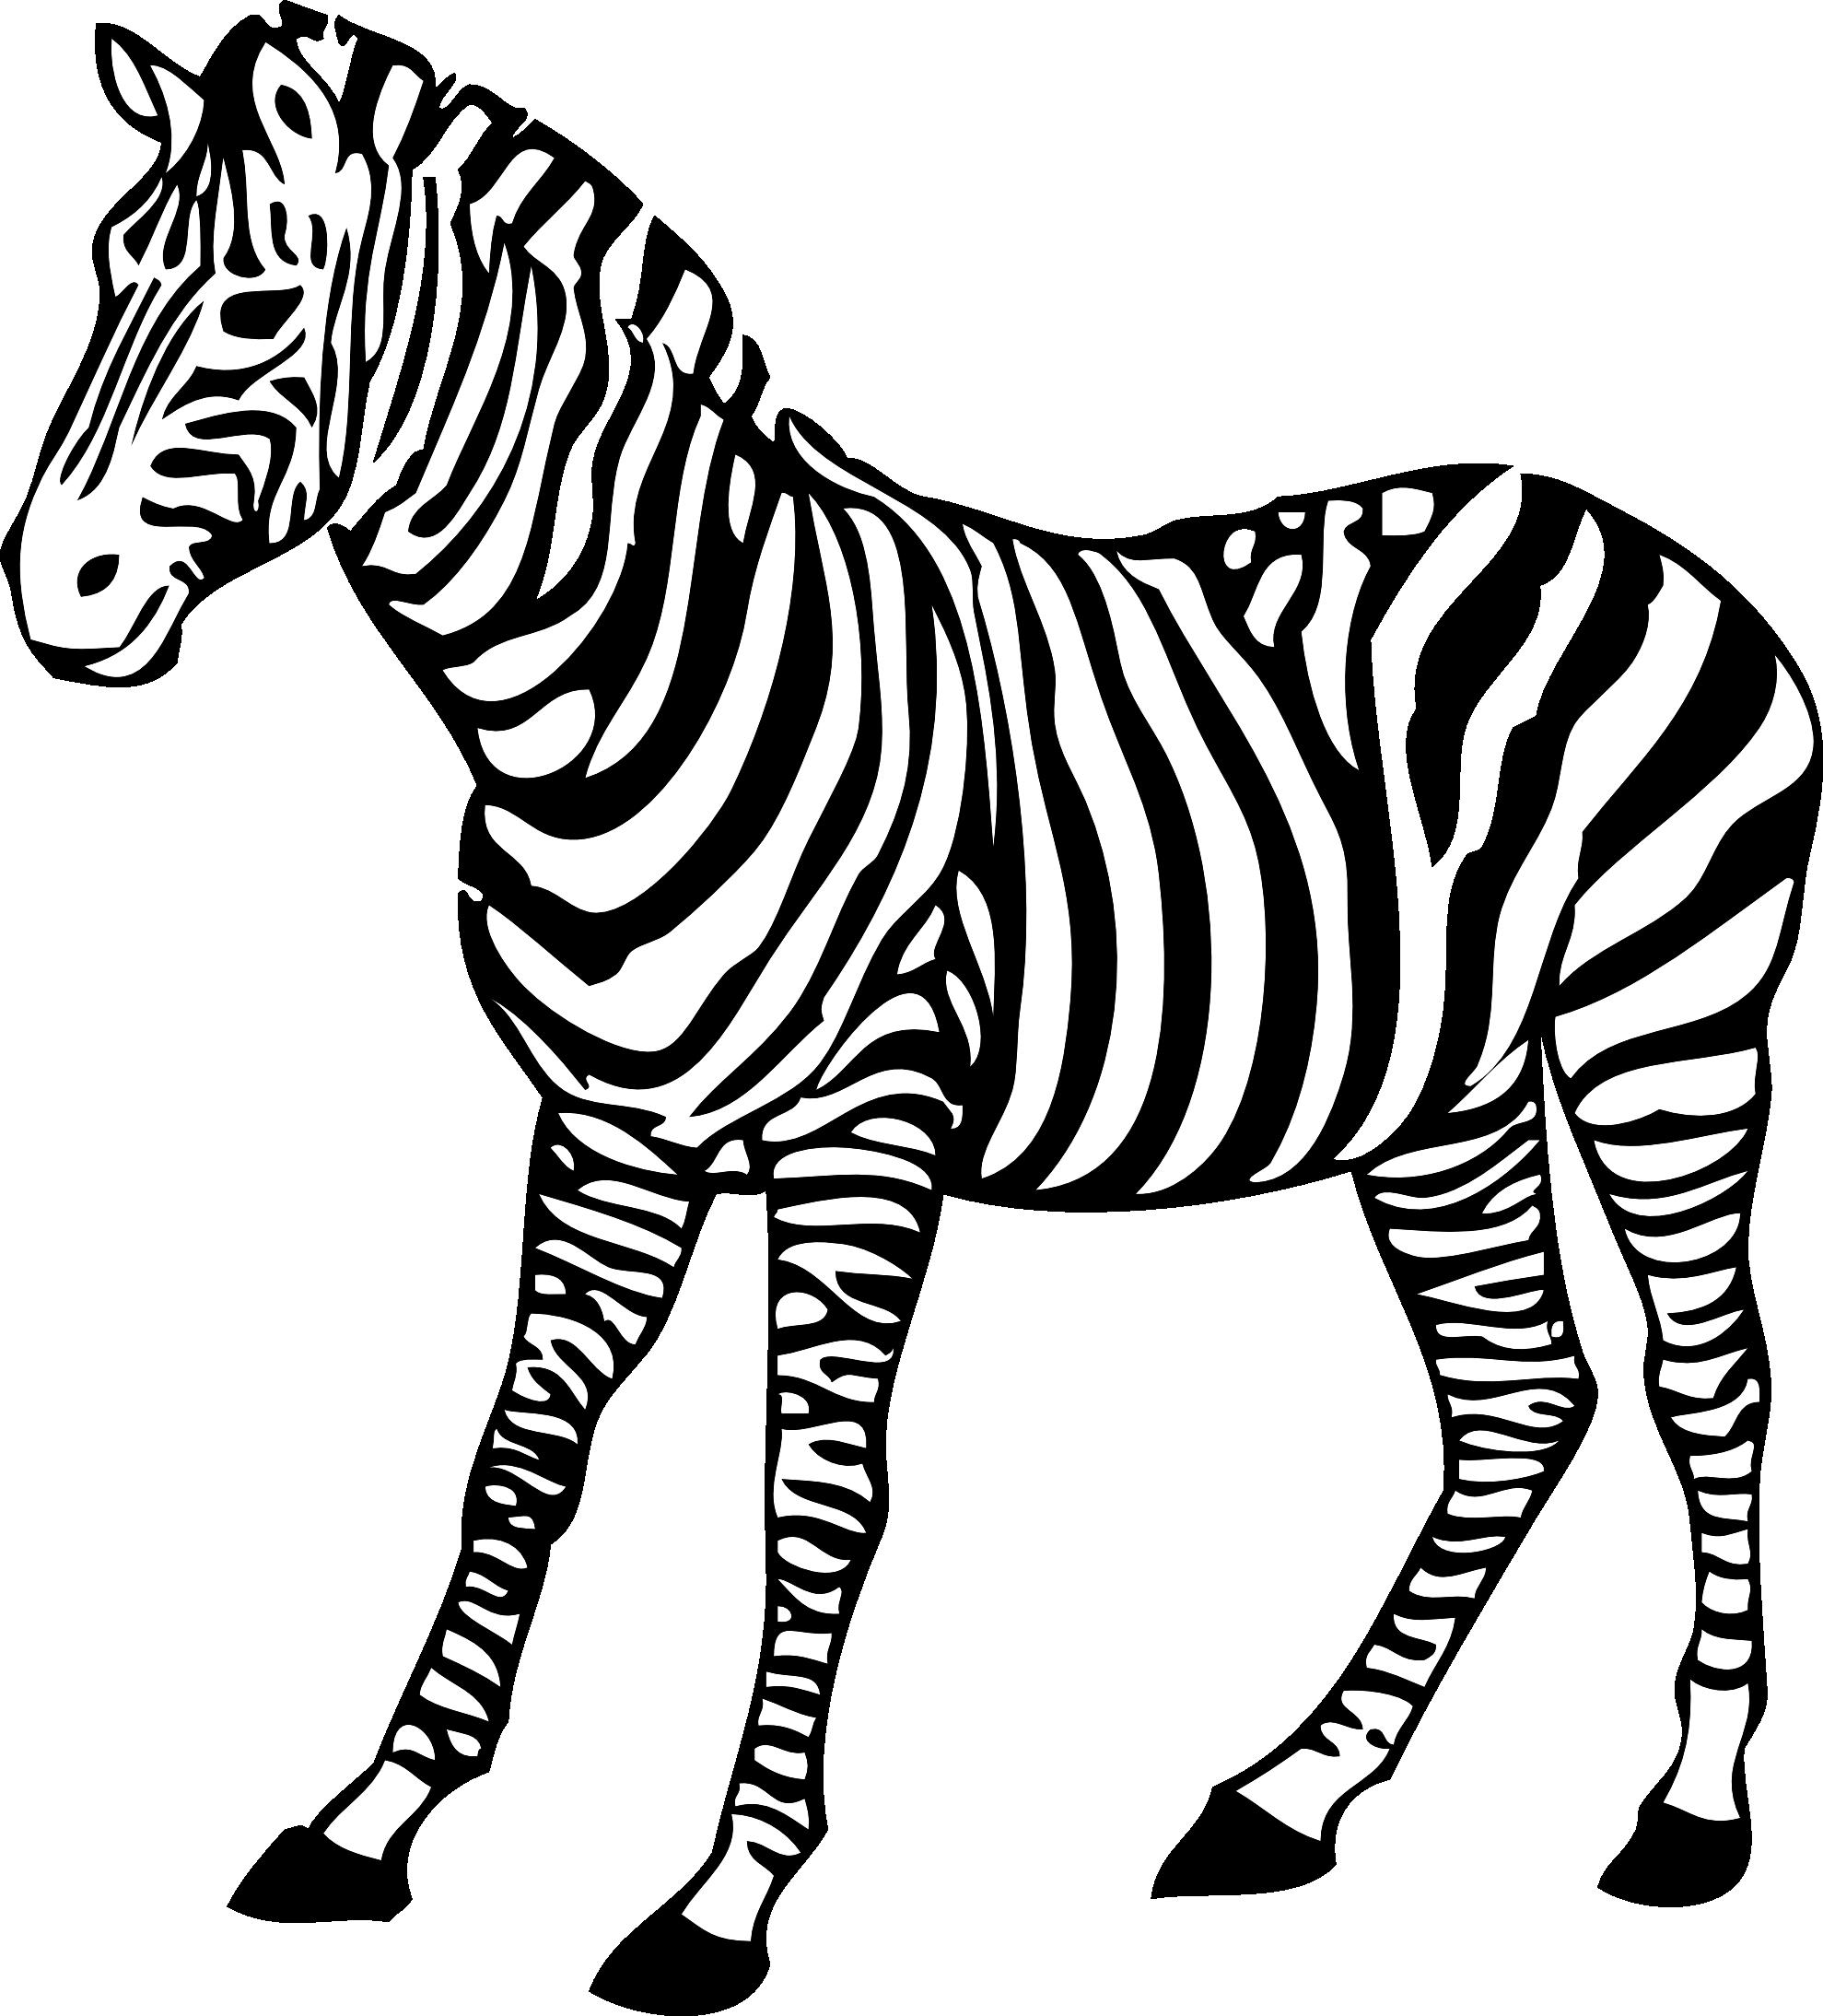 Clipart zebra giraffe. Coloring pages panda free